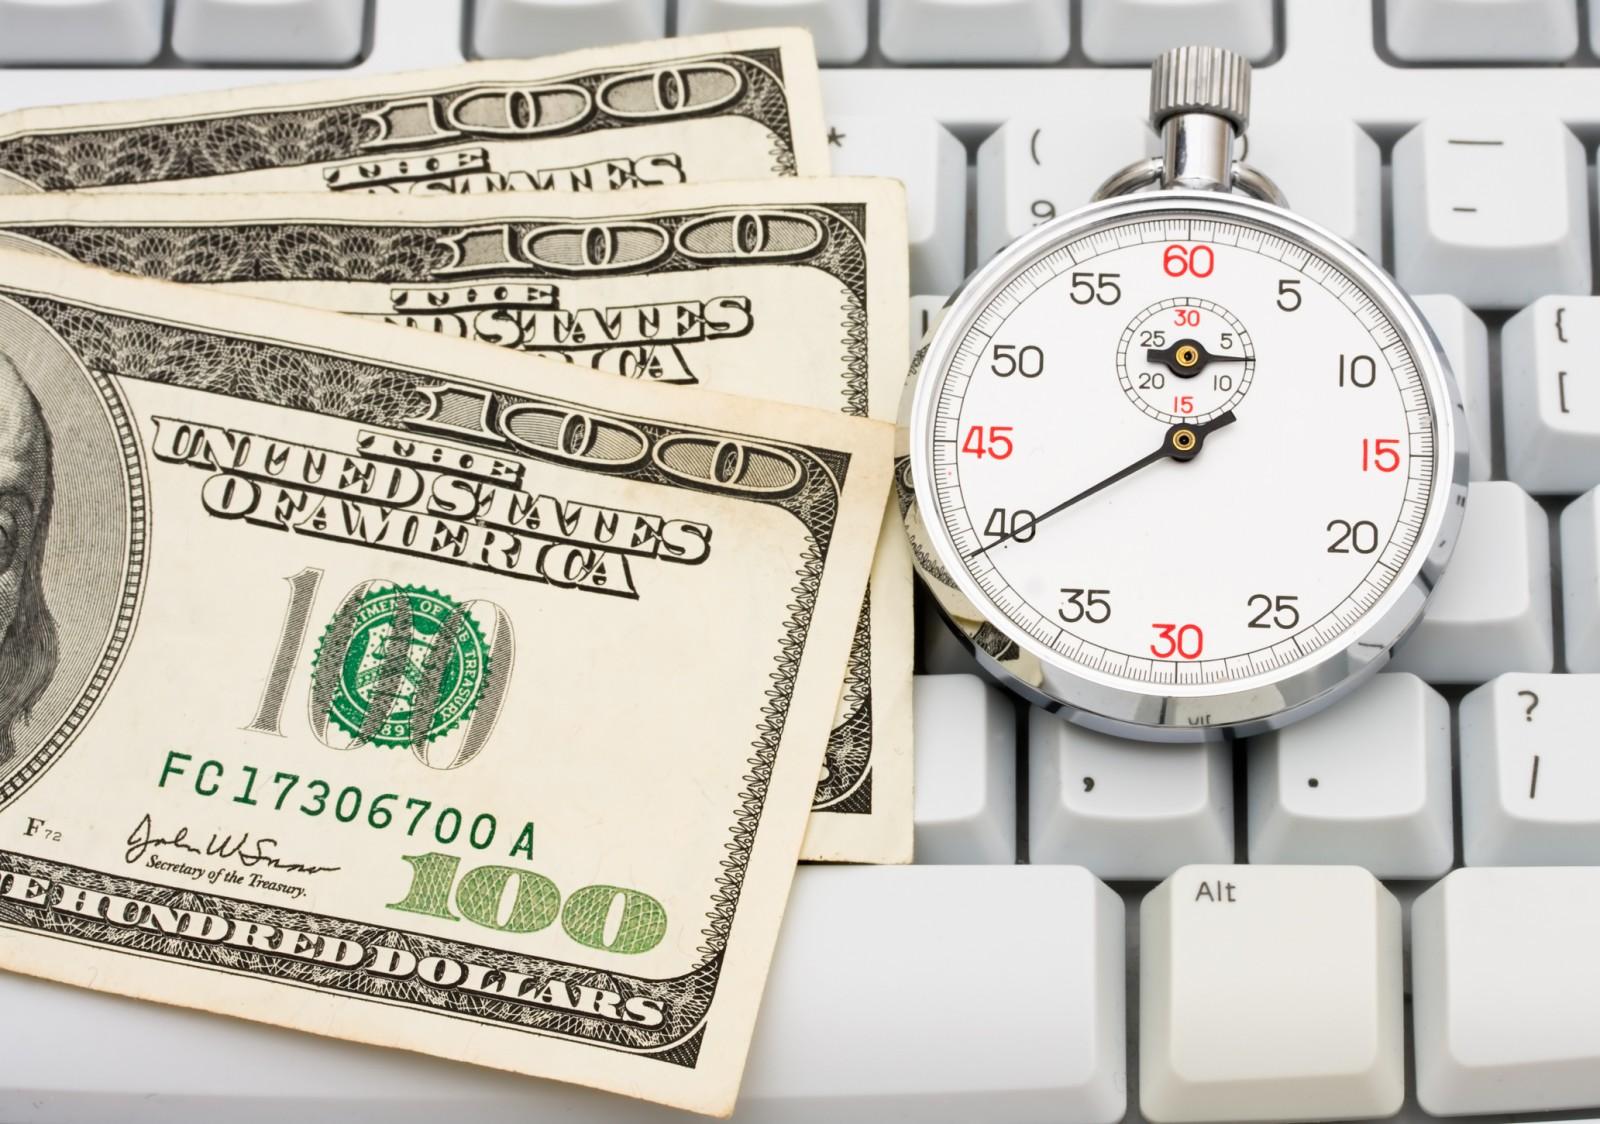 Wordpress Blog Tutorial For Beginners To Make Money Blogging Everyday  Discount Deals